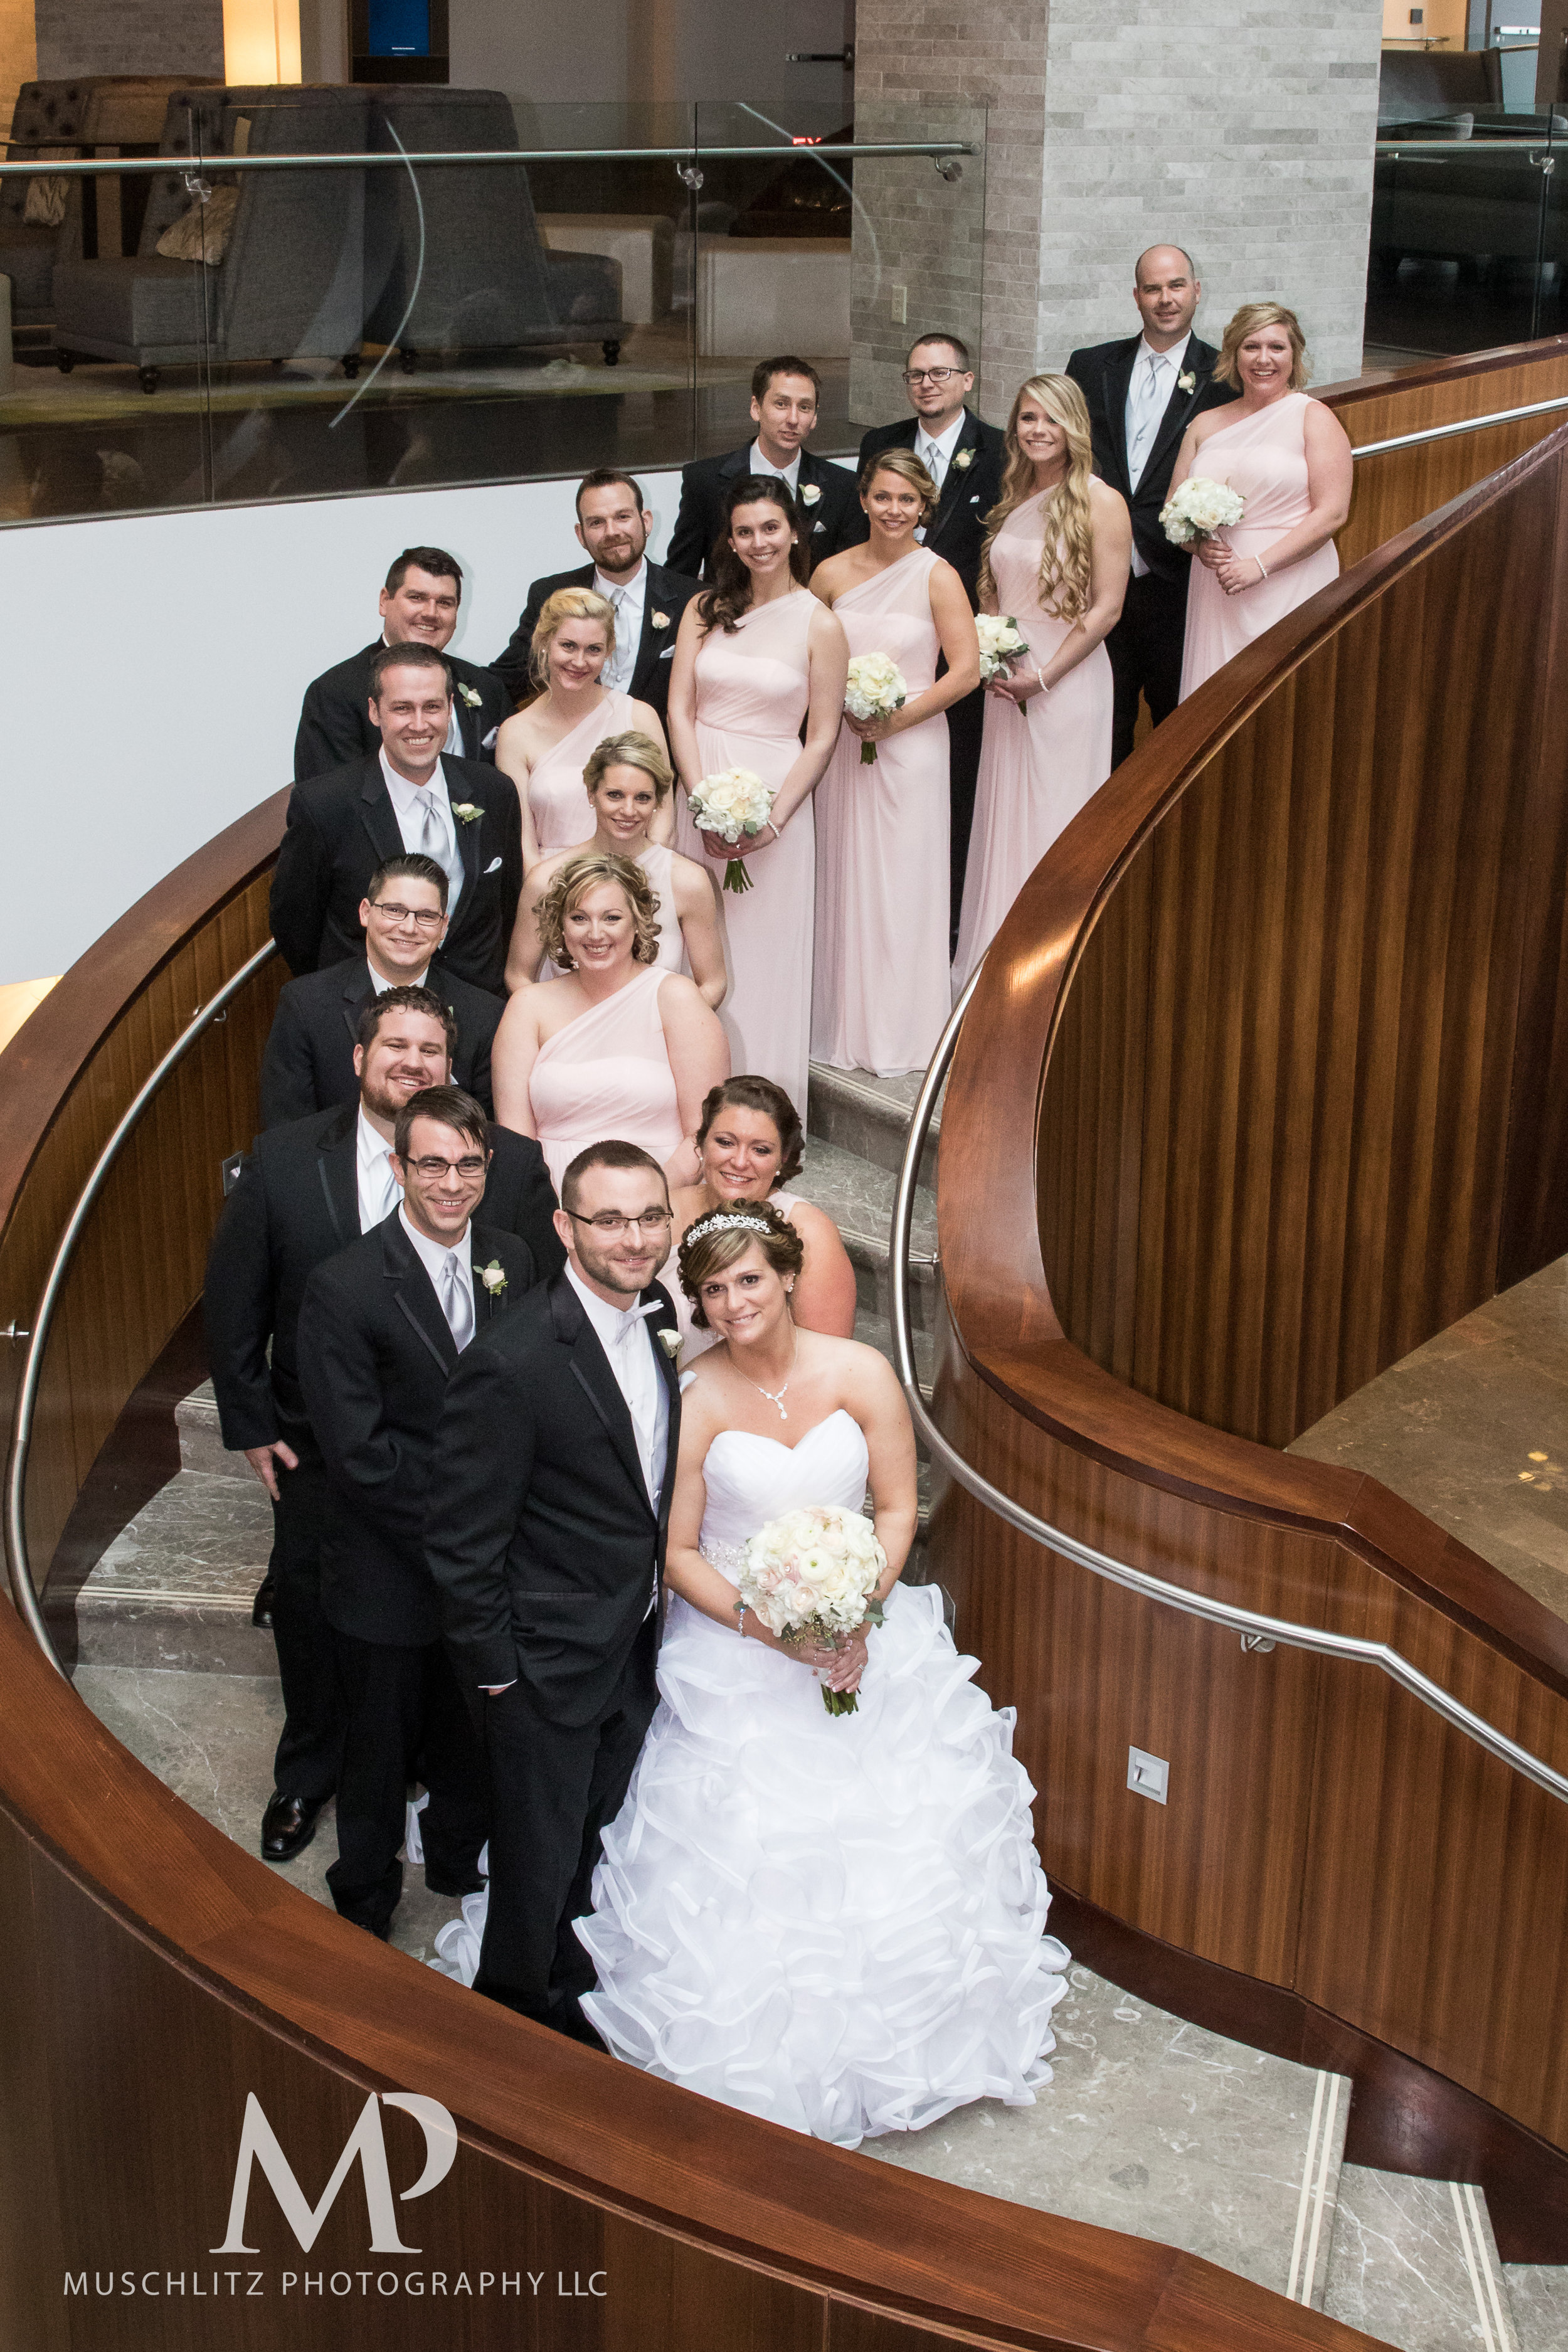 the hilton-columbus-wedding-portraits-downtown-columbus-ohio-muschlitz-photography-005.JPG